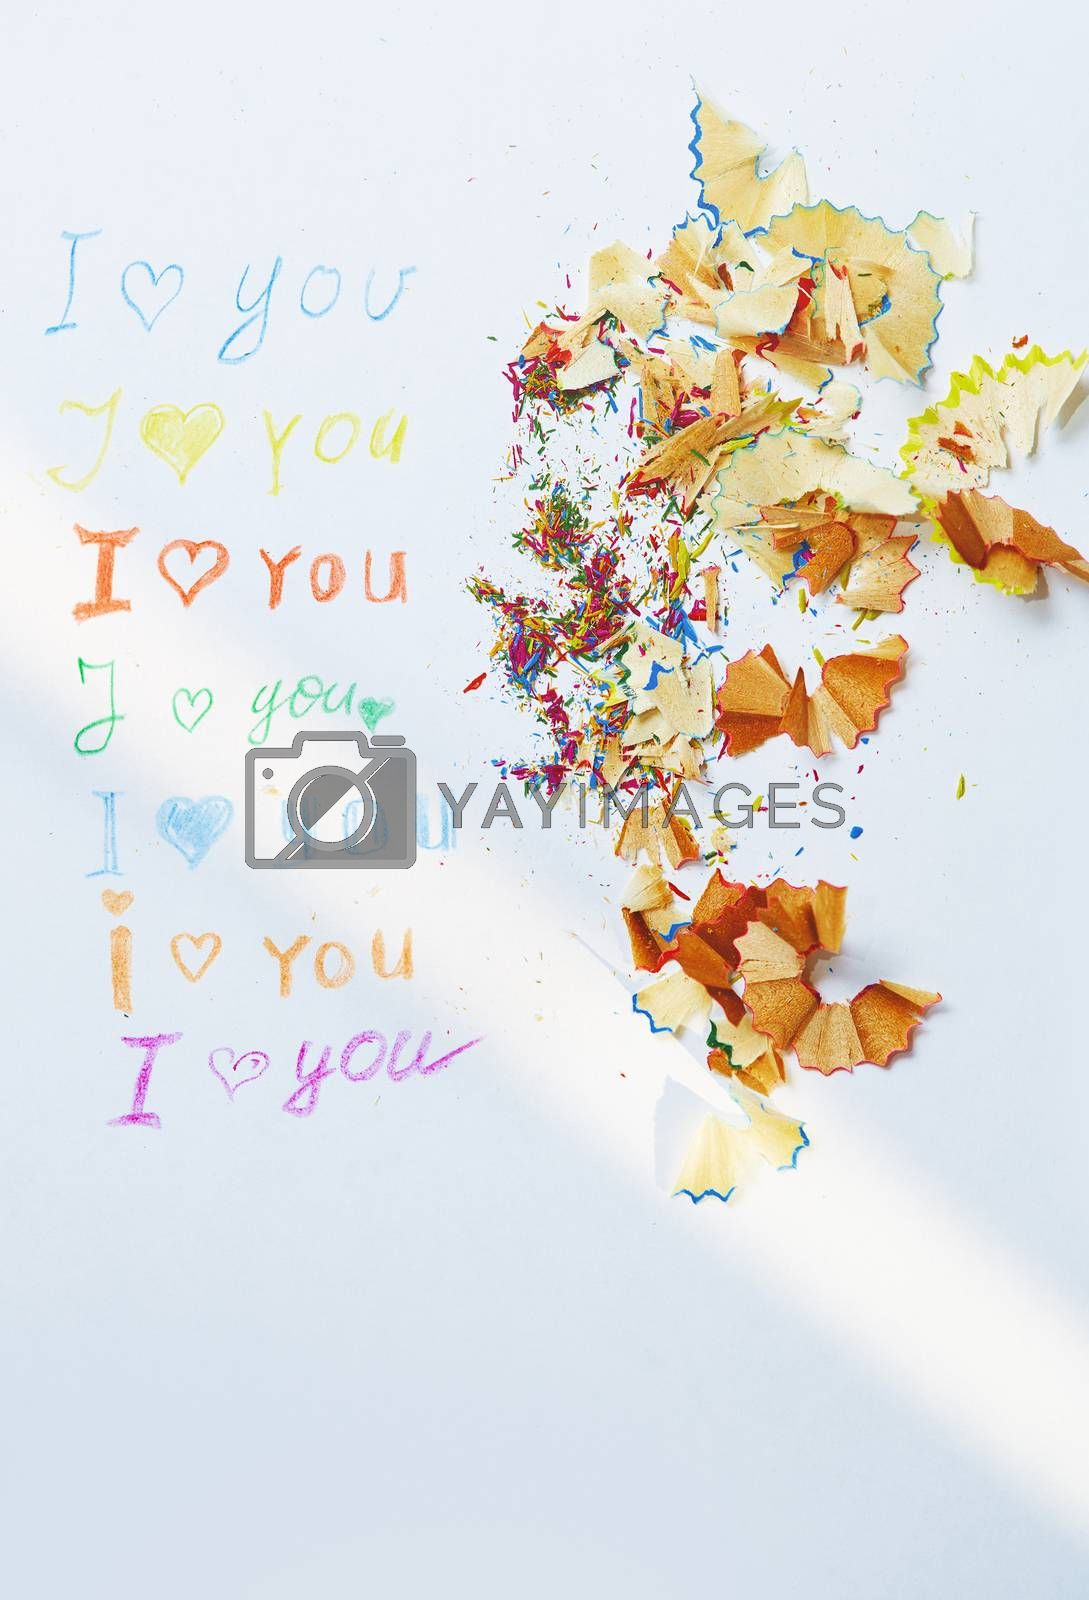 Love you by Novic